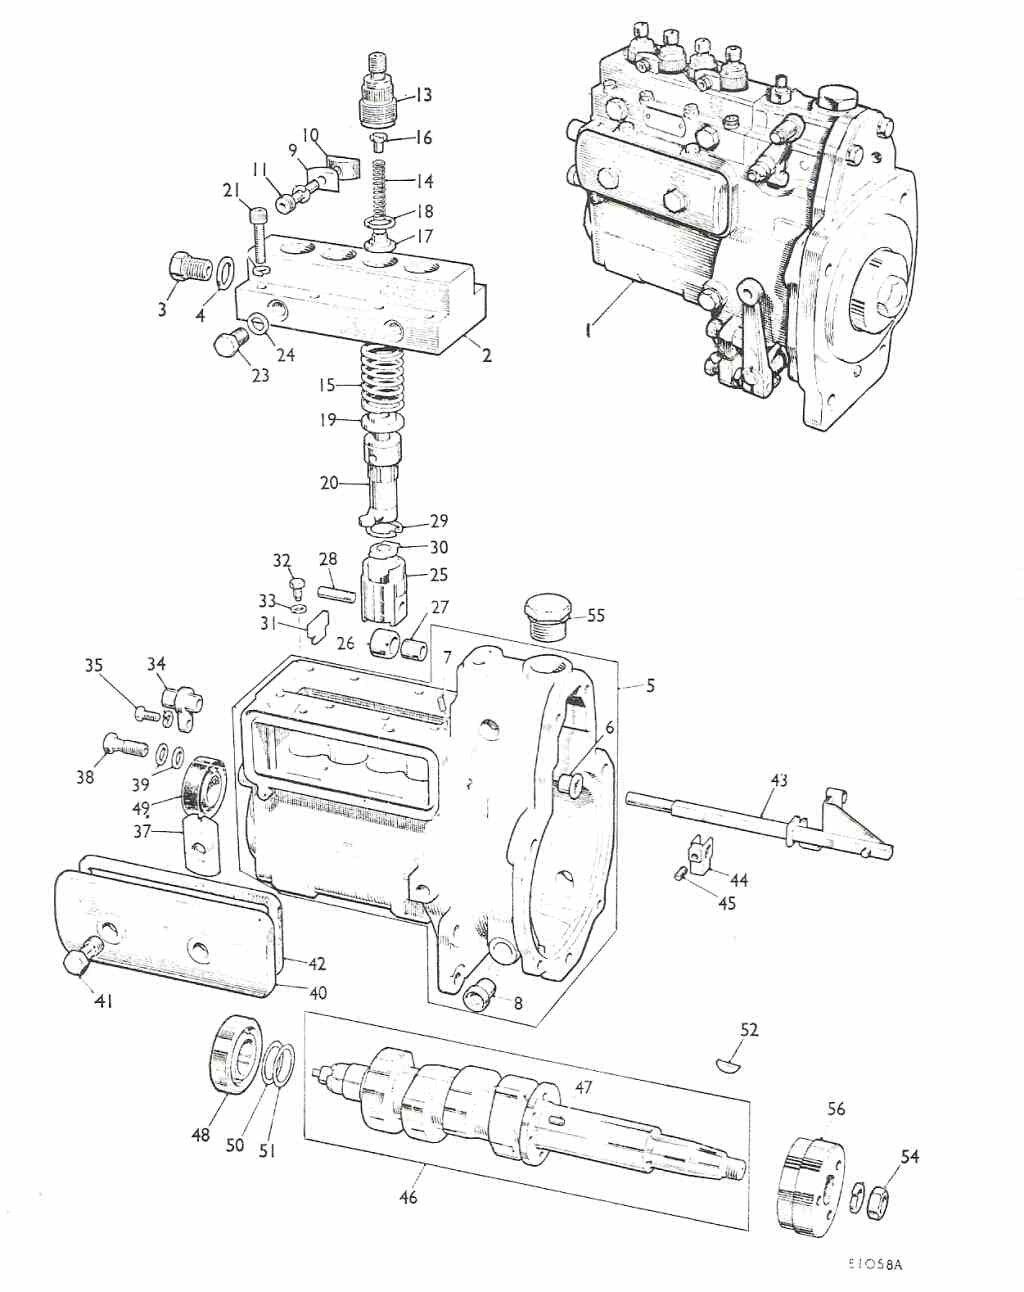 hight resolution of plunger and element for simms minimec pumps 8 0mm diesel zetor 5211 parts diagram zetor 3320 parts